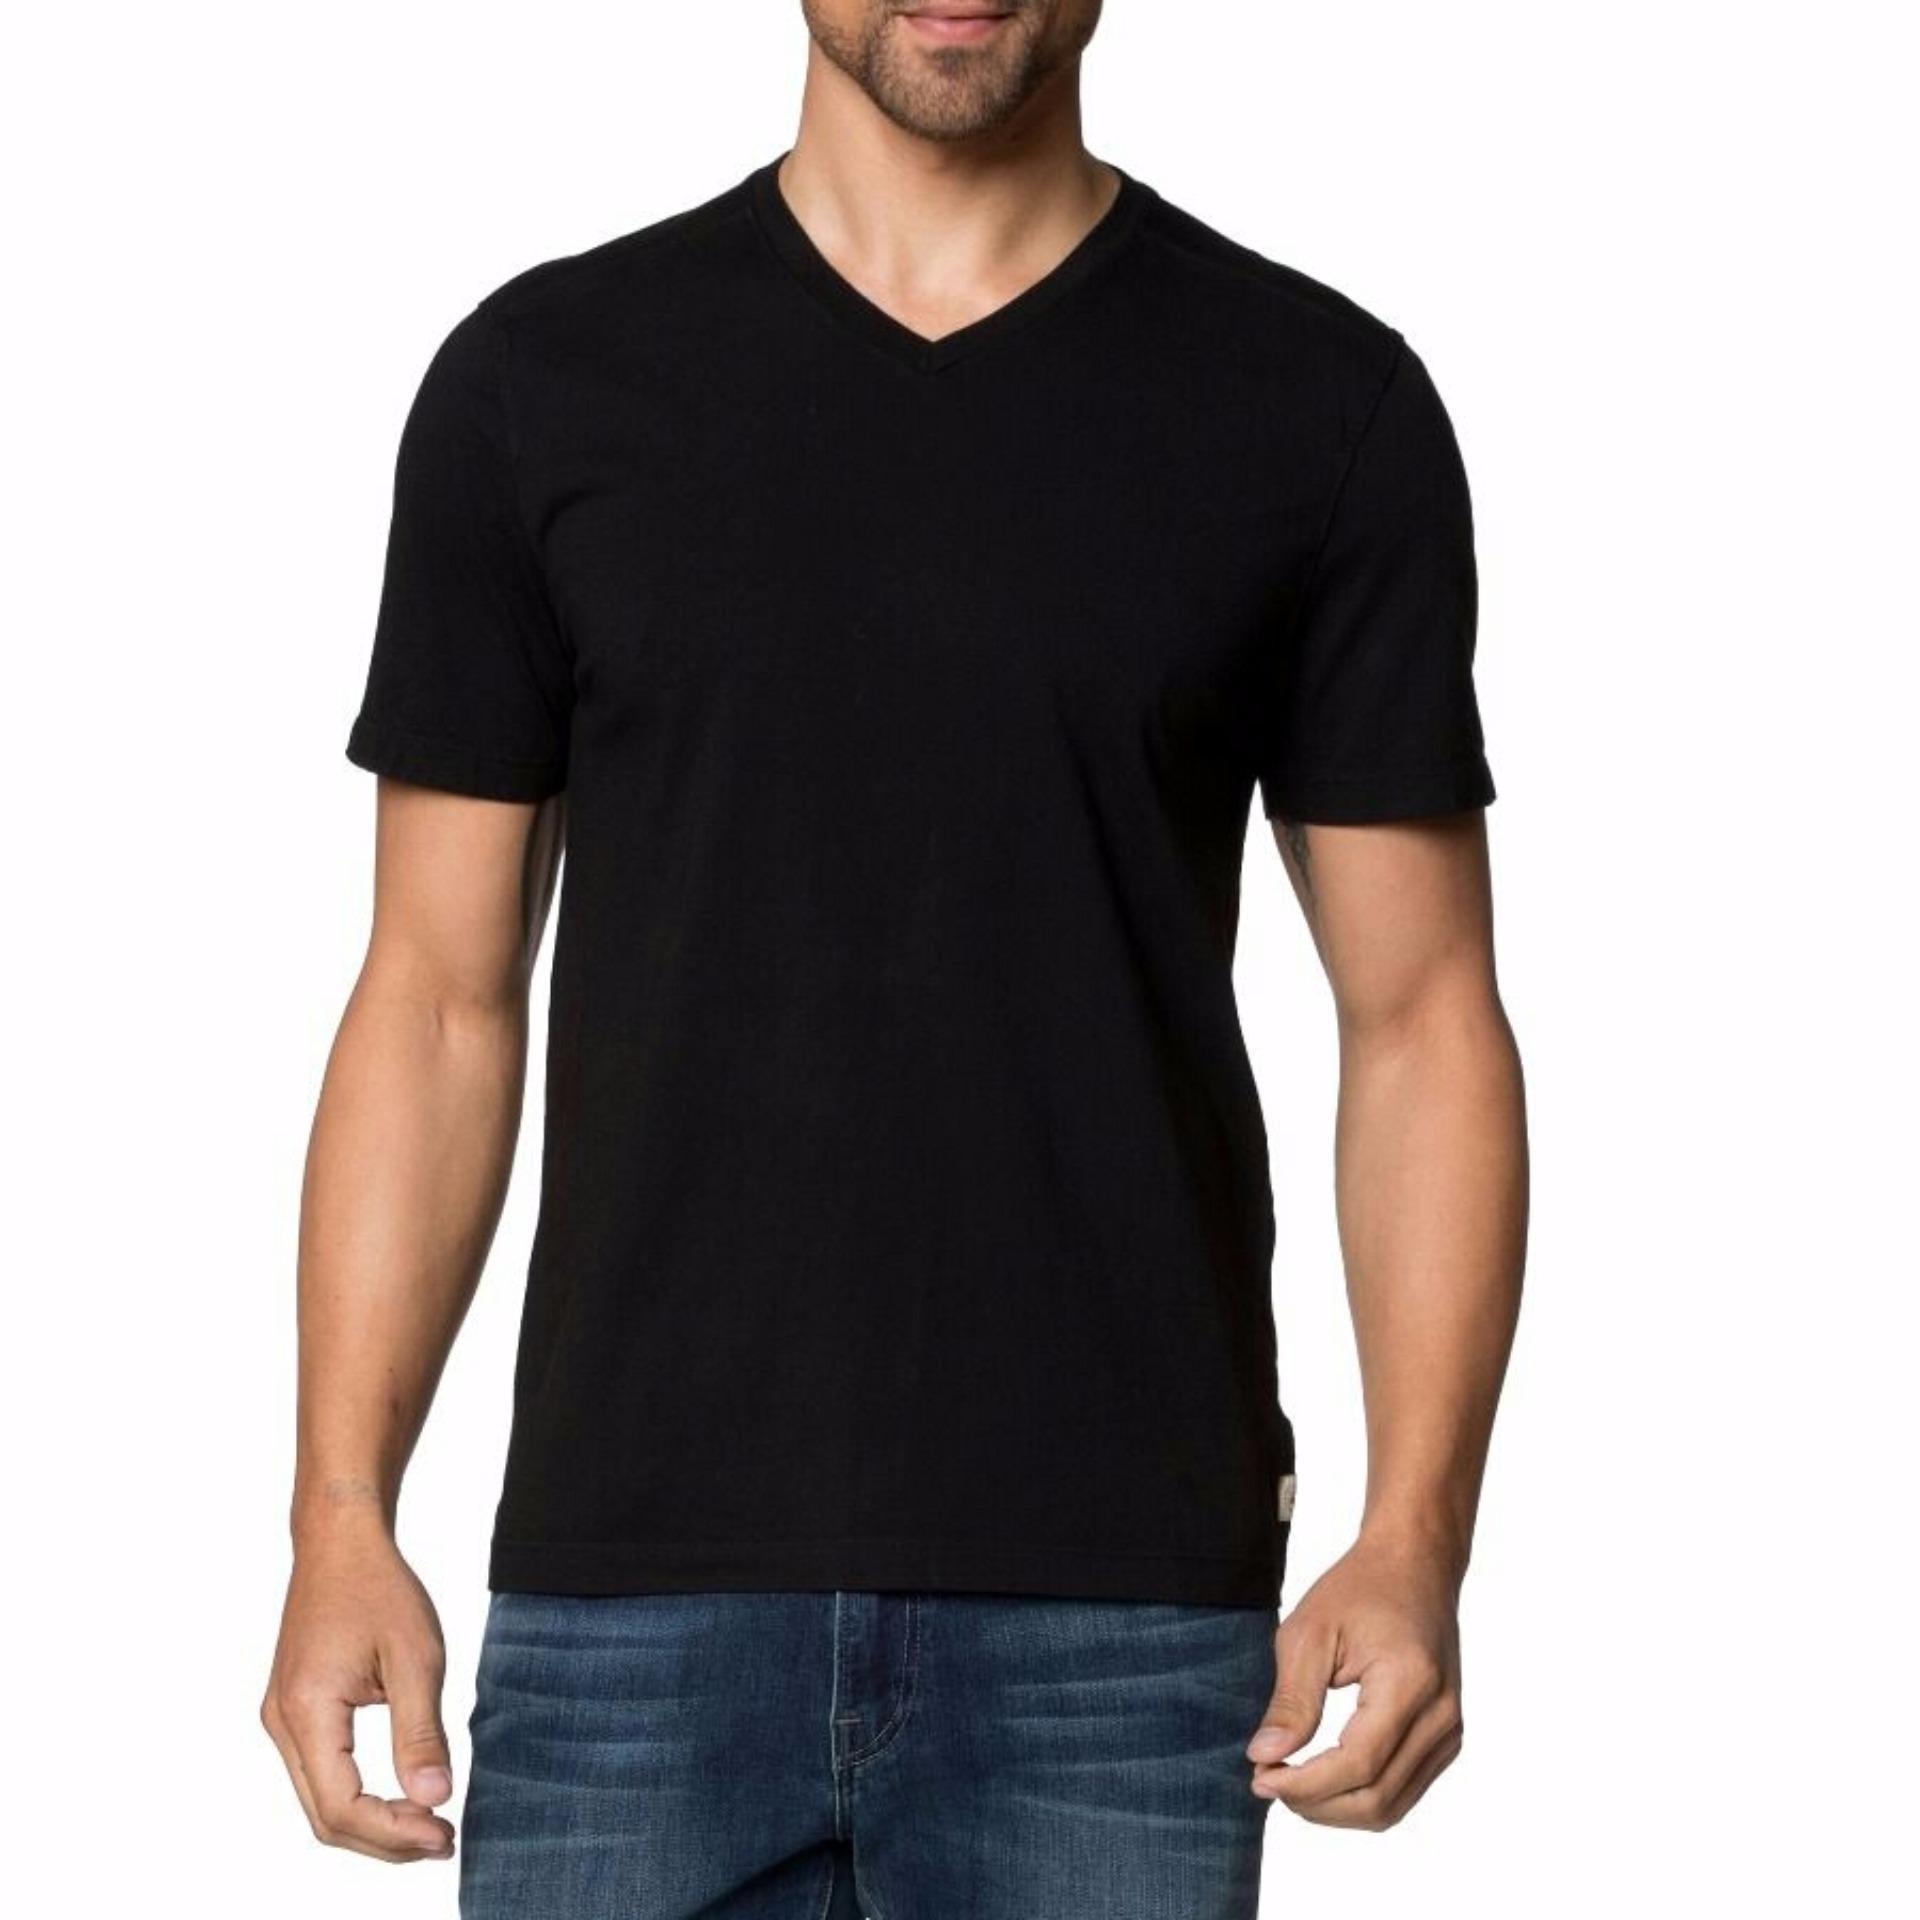 Tradeold T-shirt V-neck Kaos Polos Lengan Pendek - Hitam